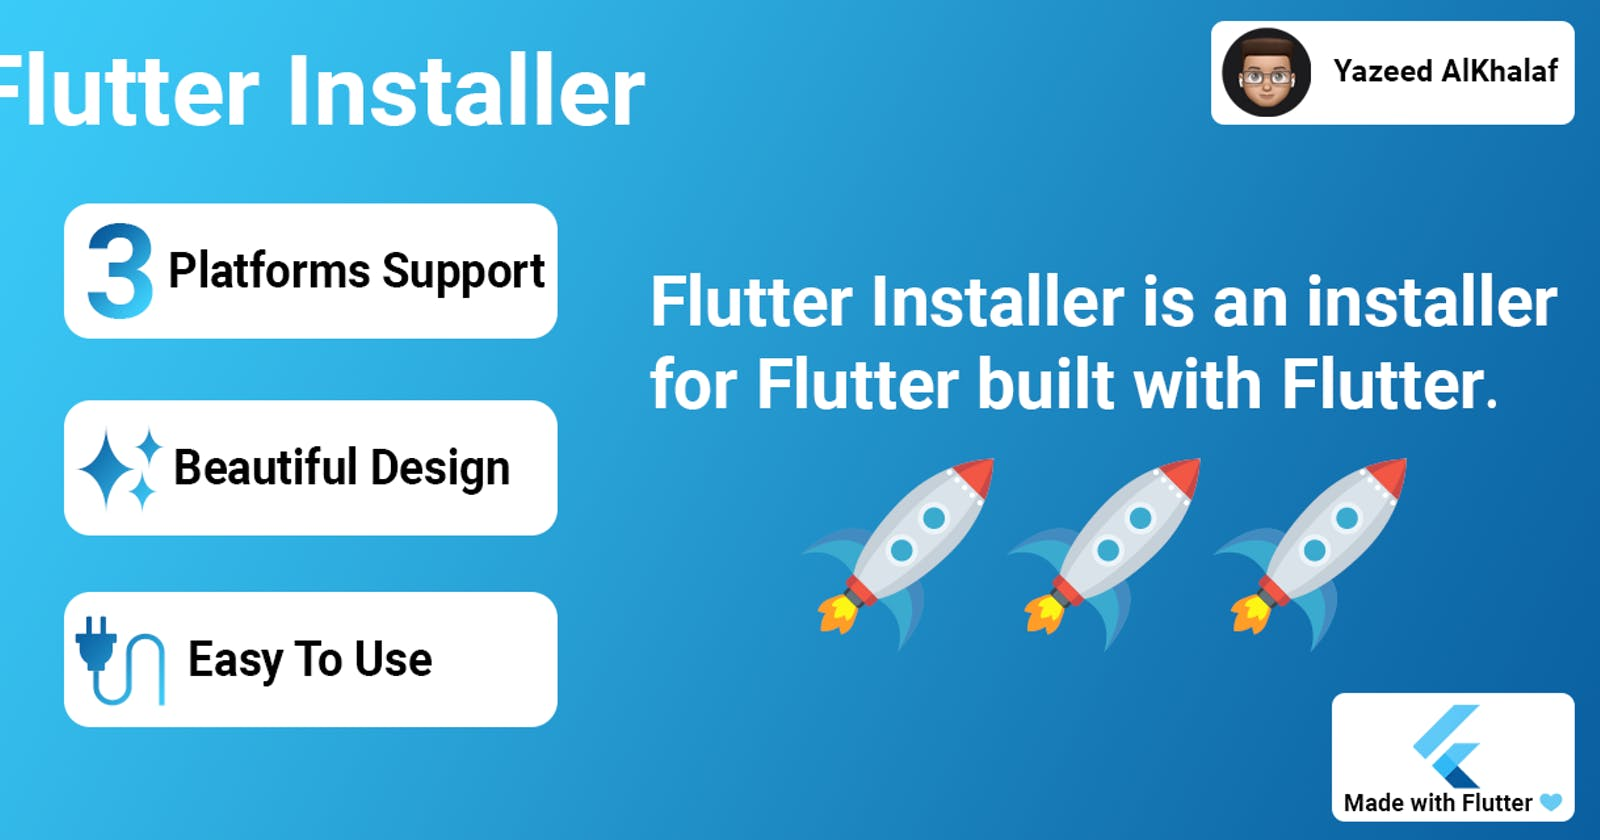 I made Flutter Installer using Flutter 🚀